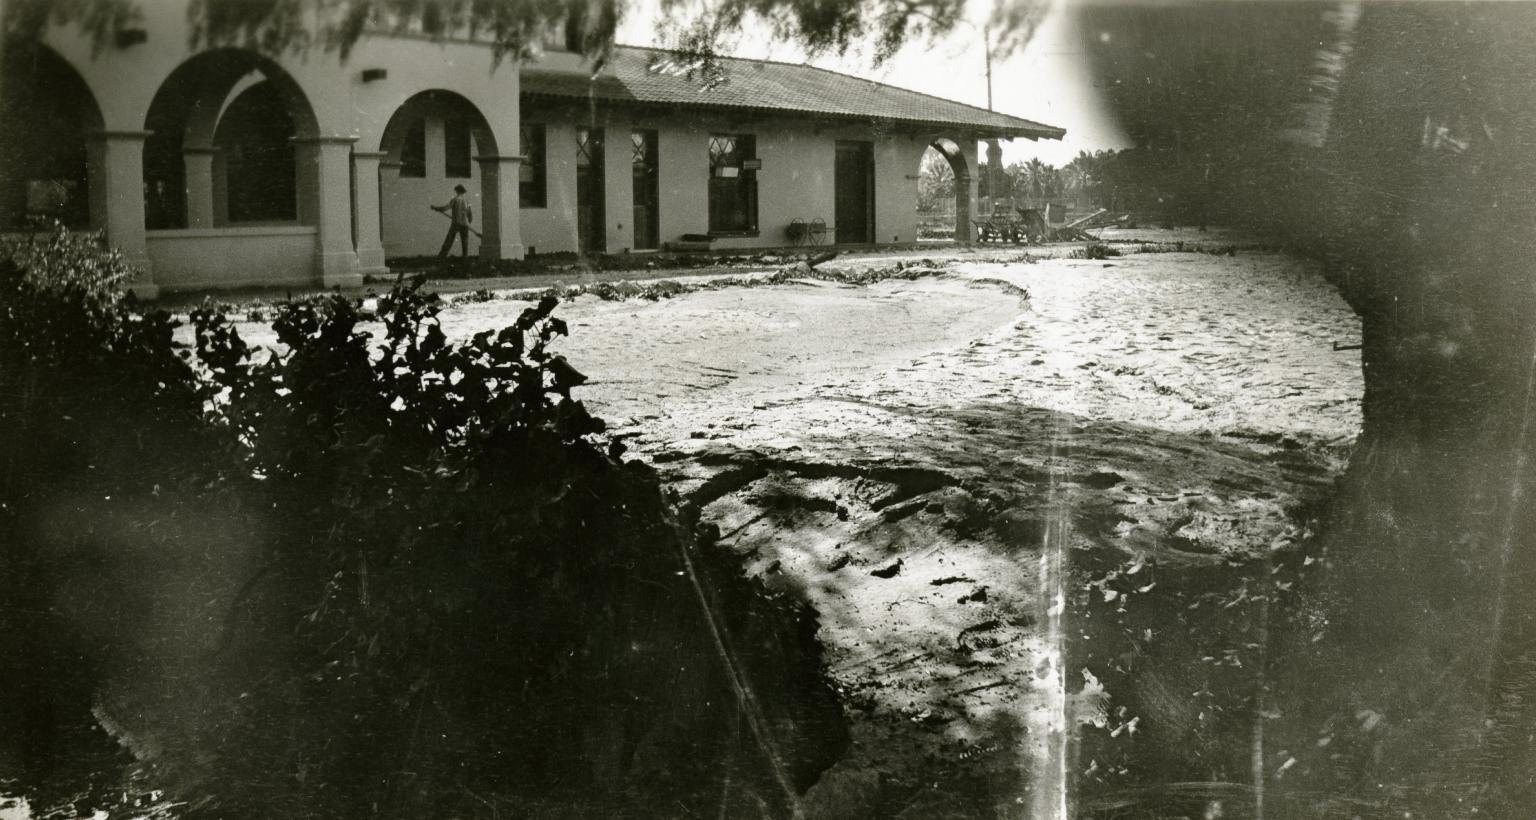 Flood Damage - Train depot, Santa Barbara